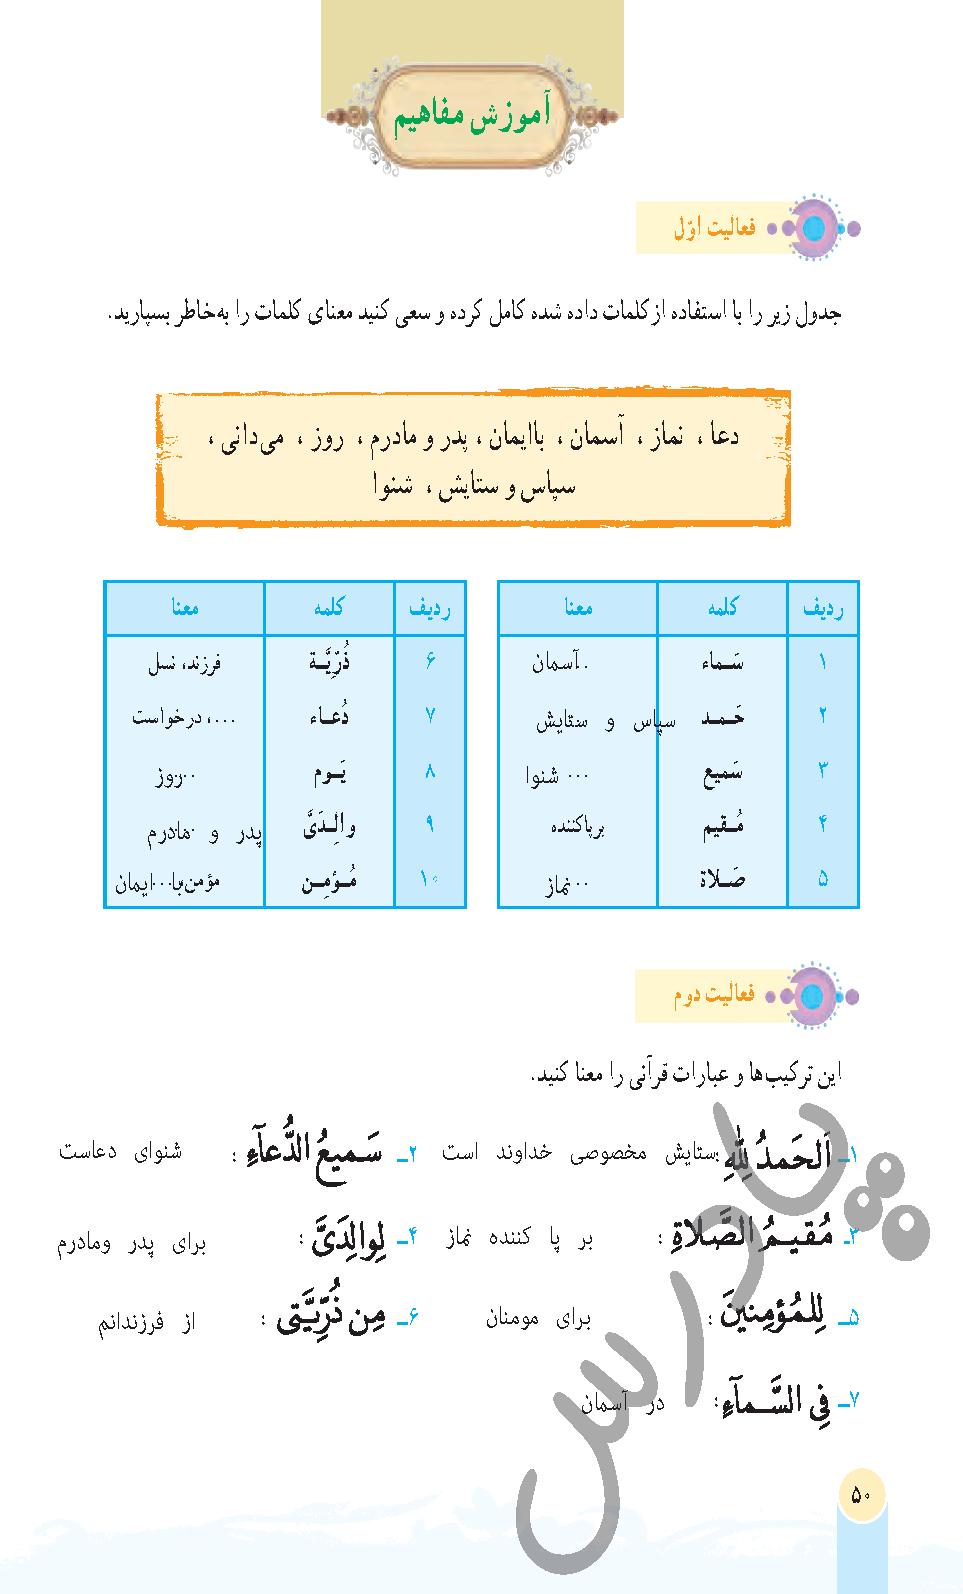 پاسخ فعالیت درس 5 قرآن هفتم - جلسه اول